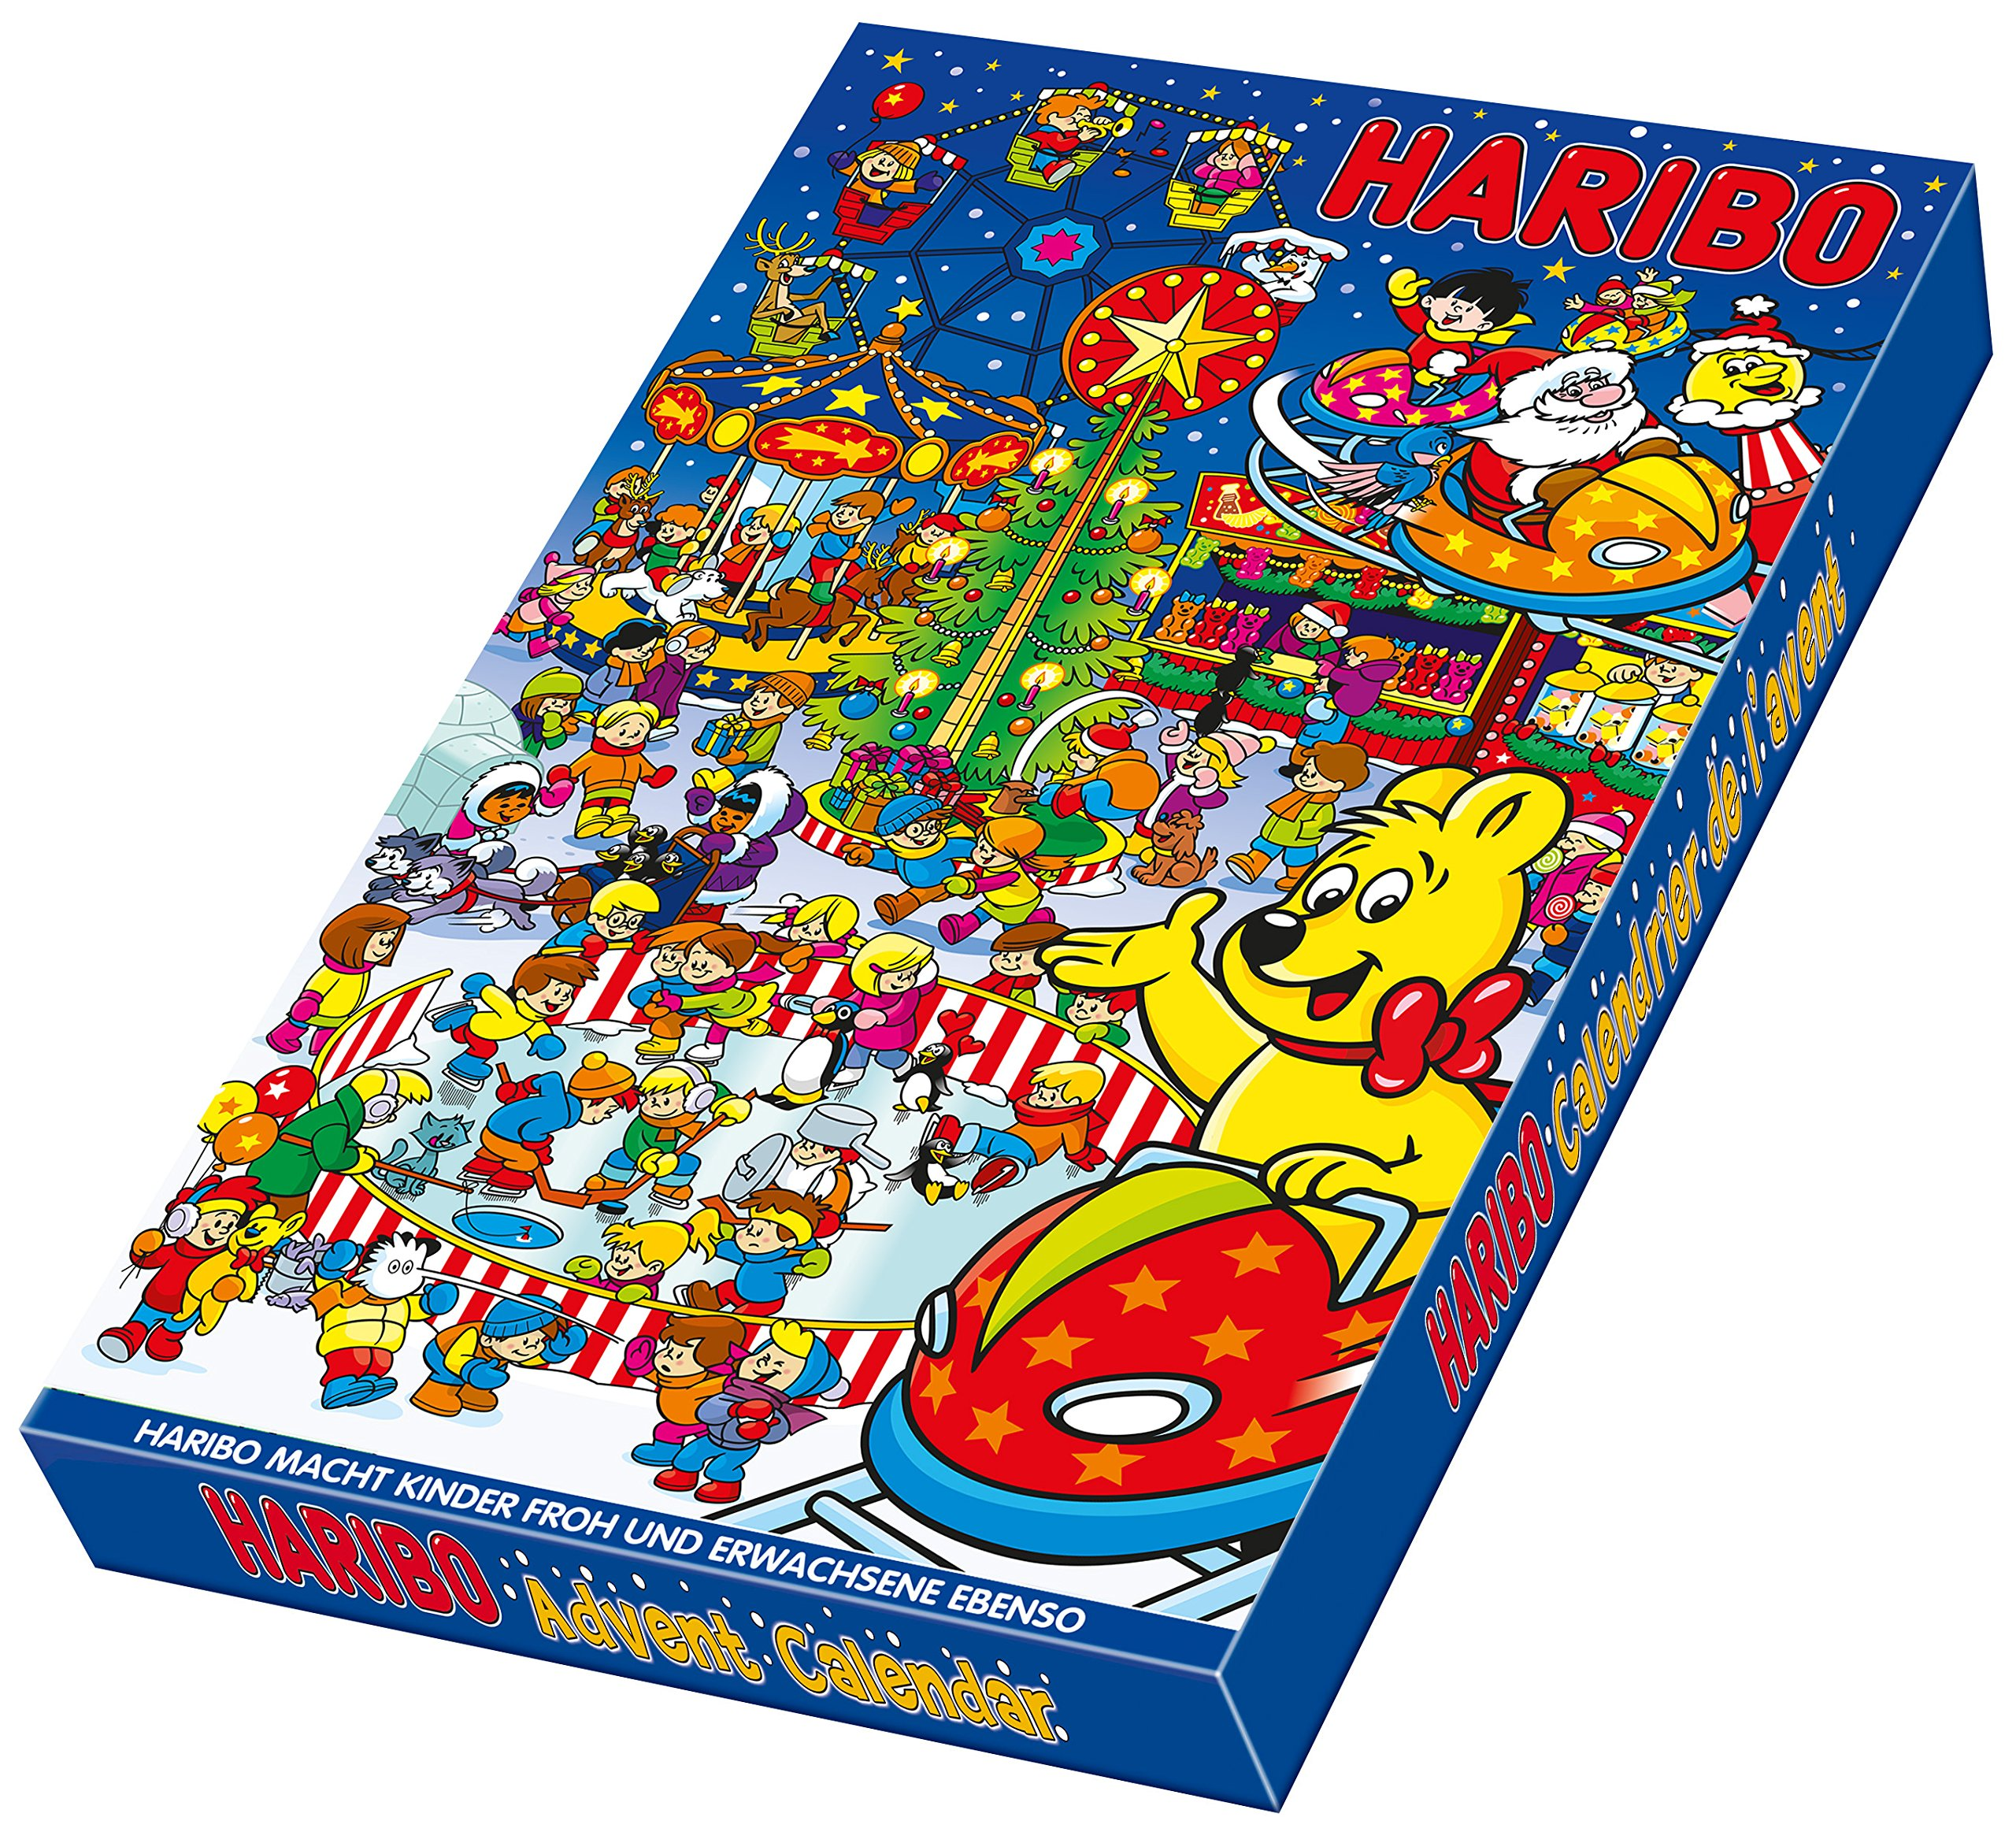 Kinder Mini Mix Advent Calendar, 152g: Amazon.com: Grocery